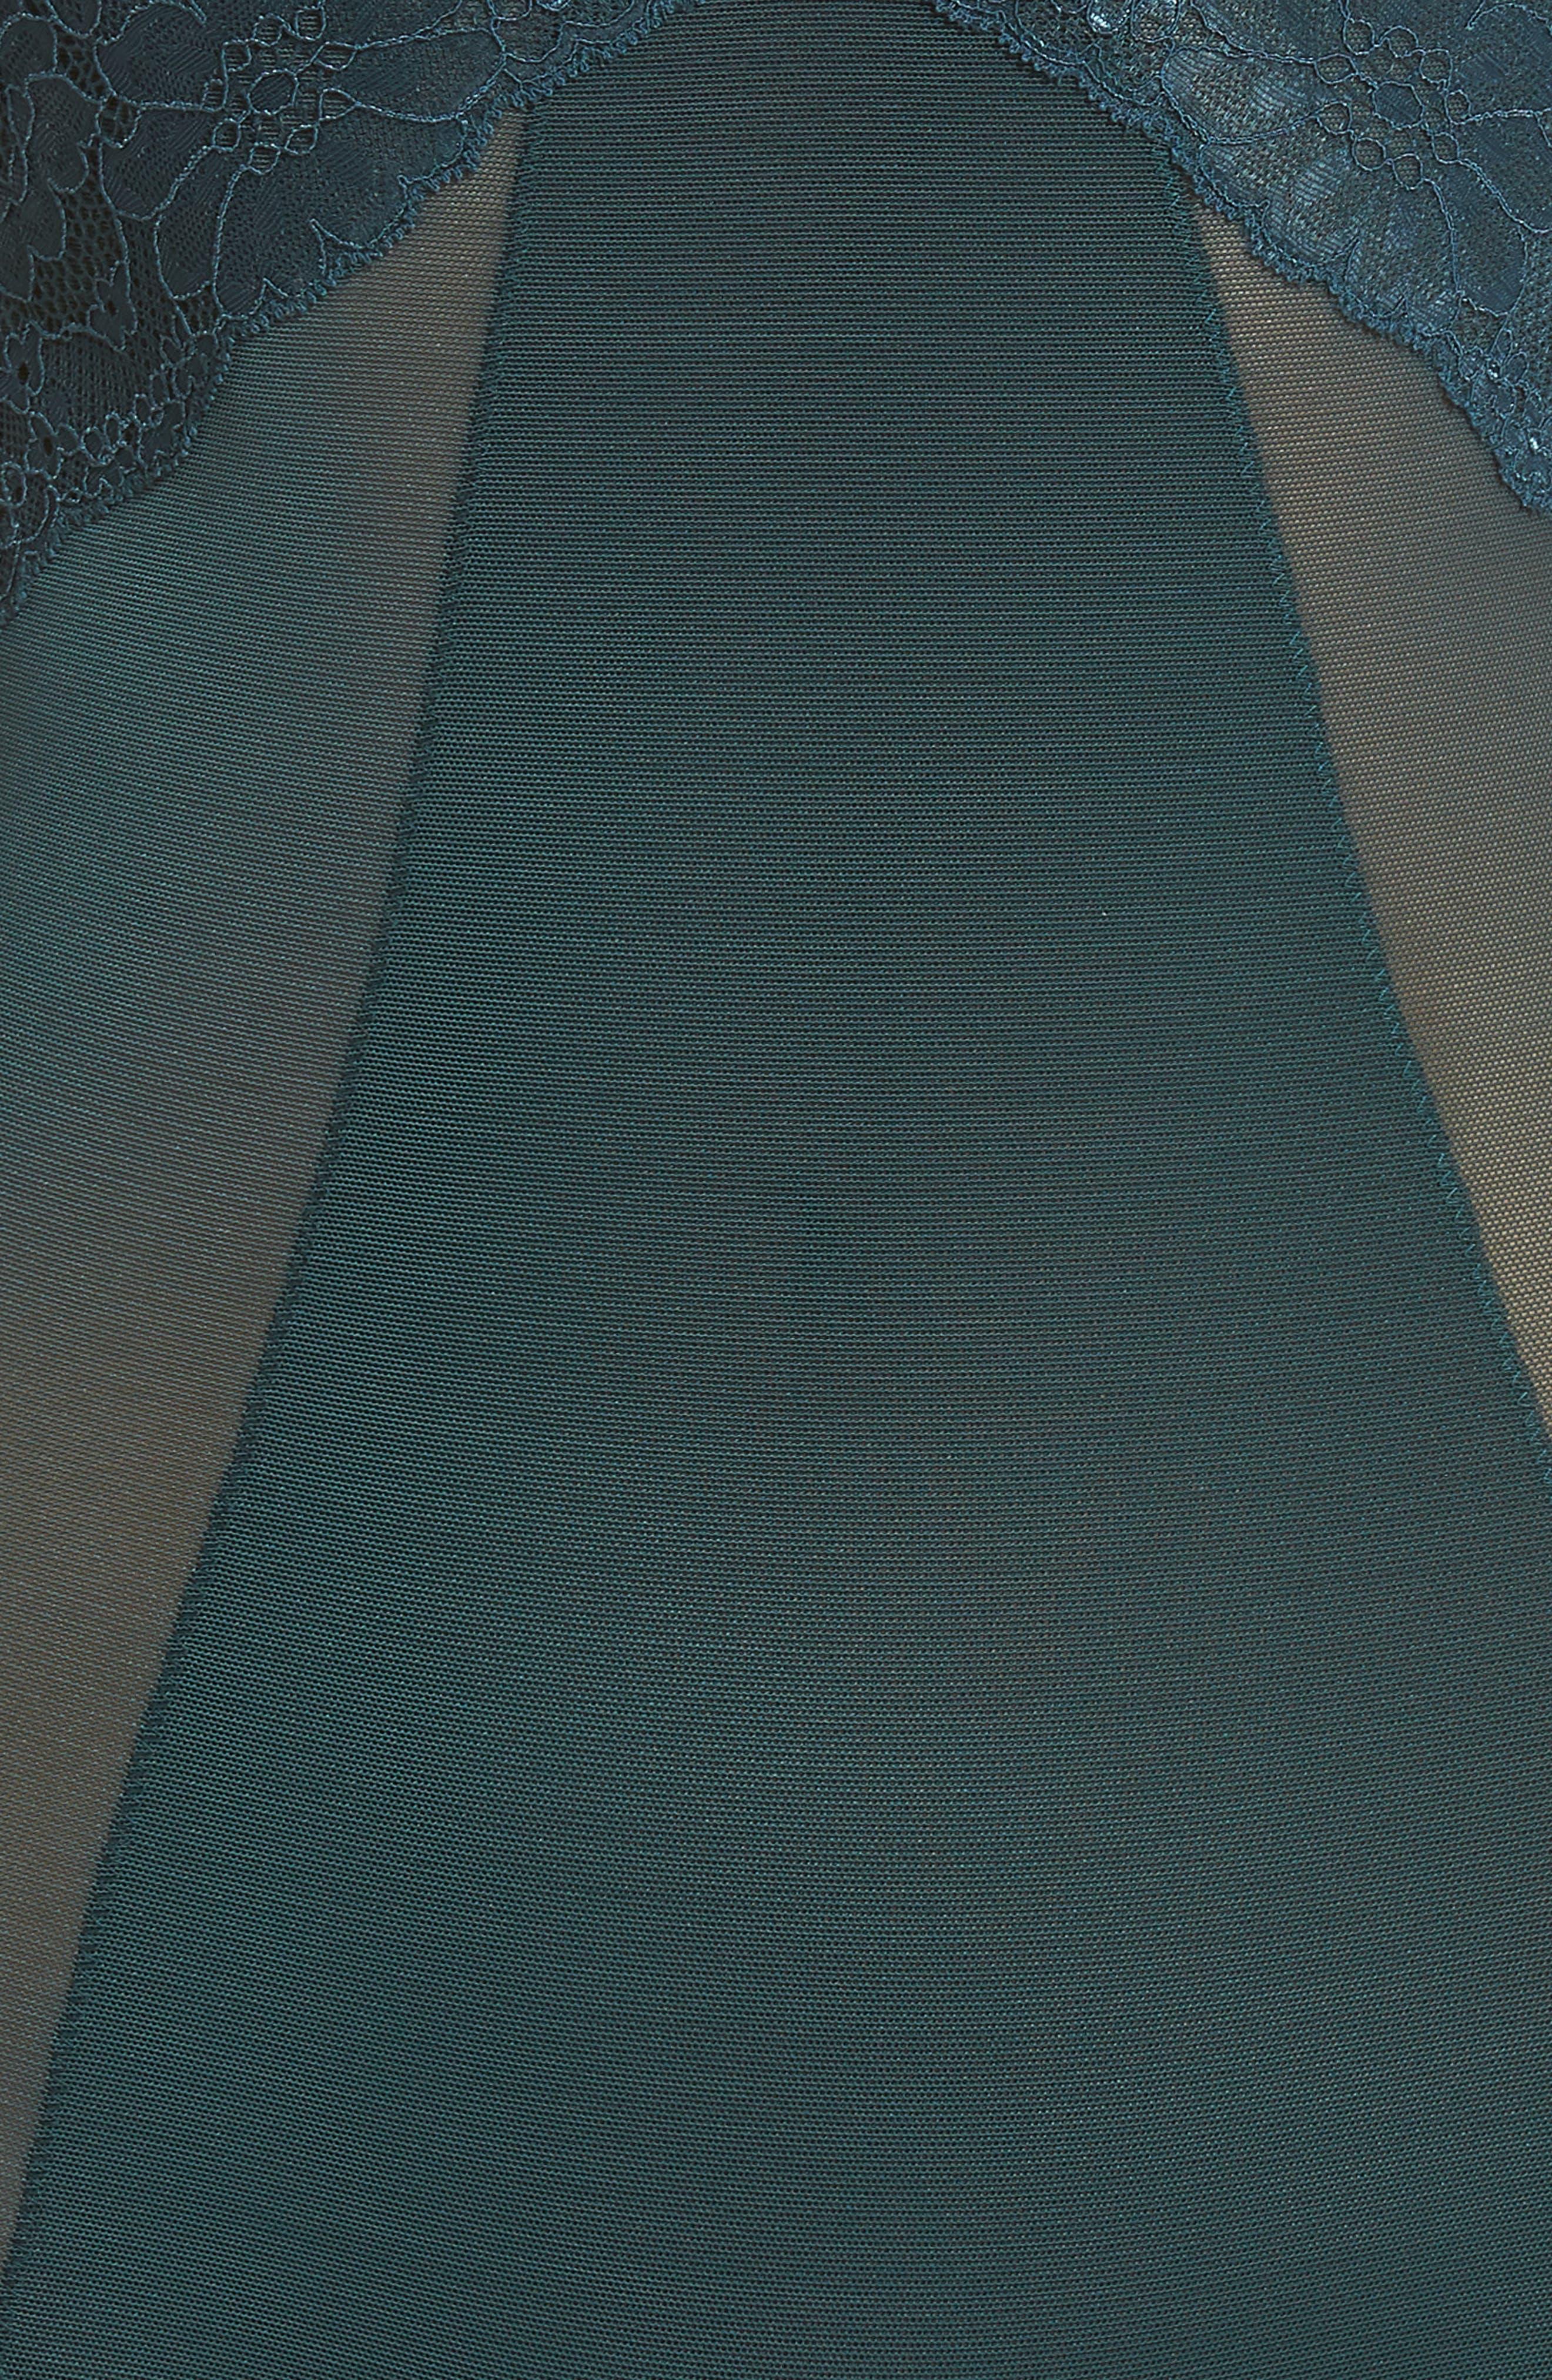 Spotlight On Lace Bodysuit,                             Alternate thumbnail 6, color,                             MALACHITE